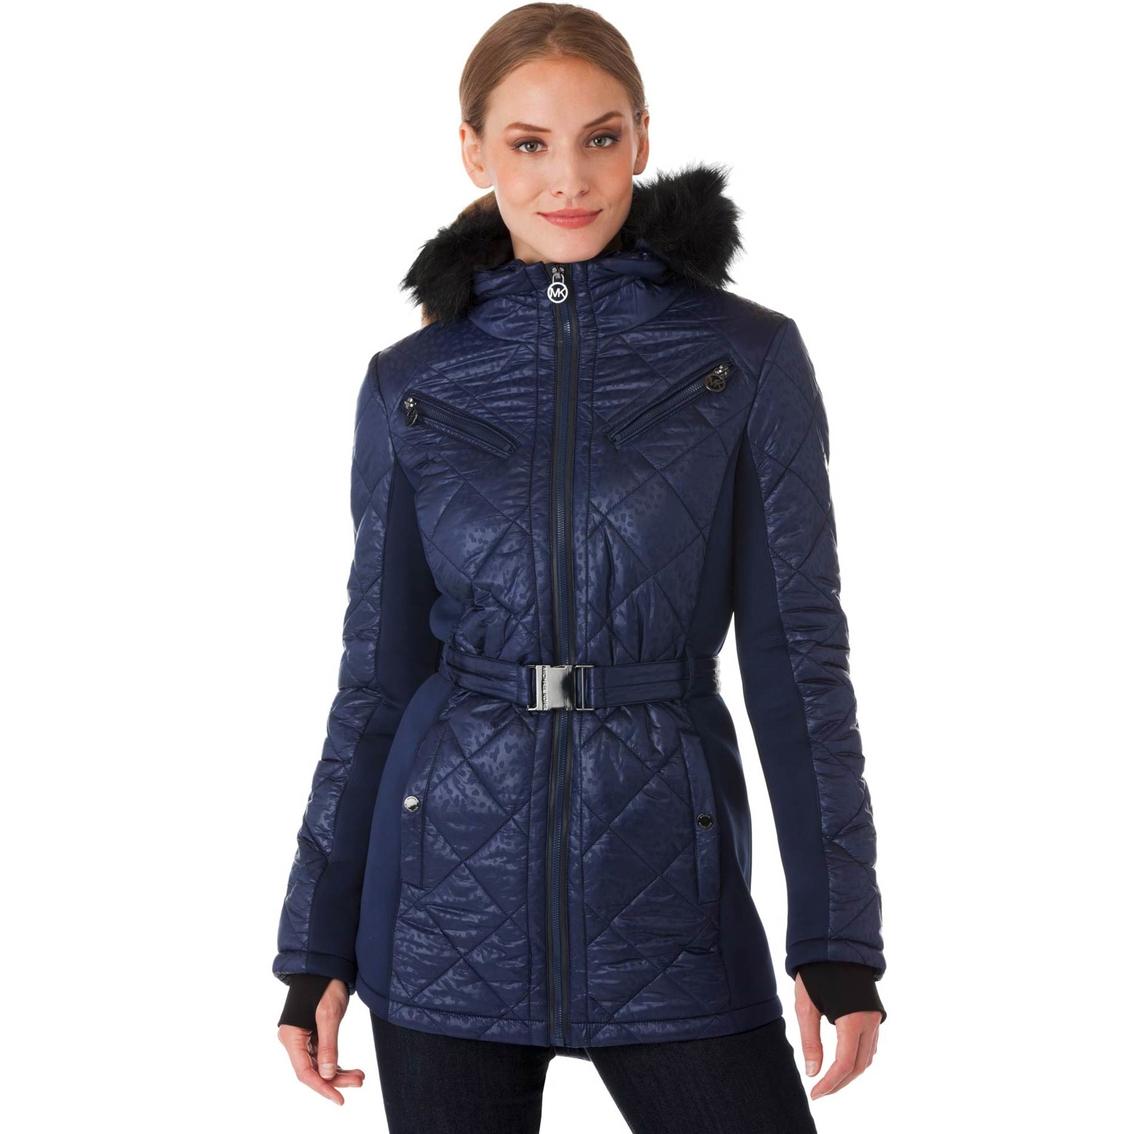 52a1982da5f9 Michael Kors Anorak Jacket   Apparel   Shop The Exchange